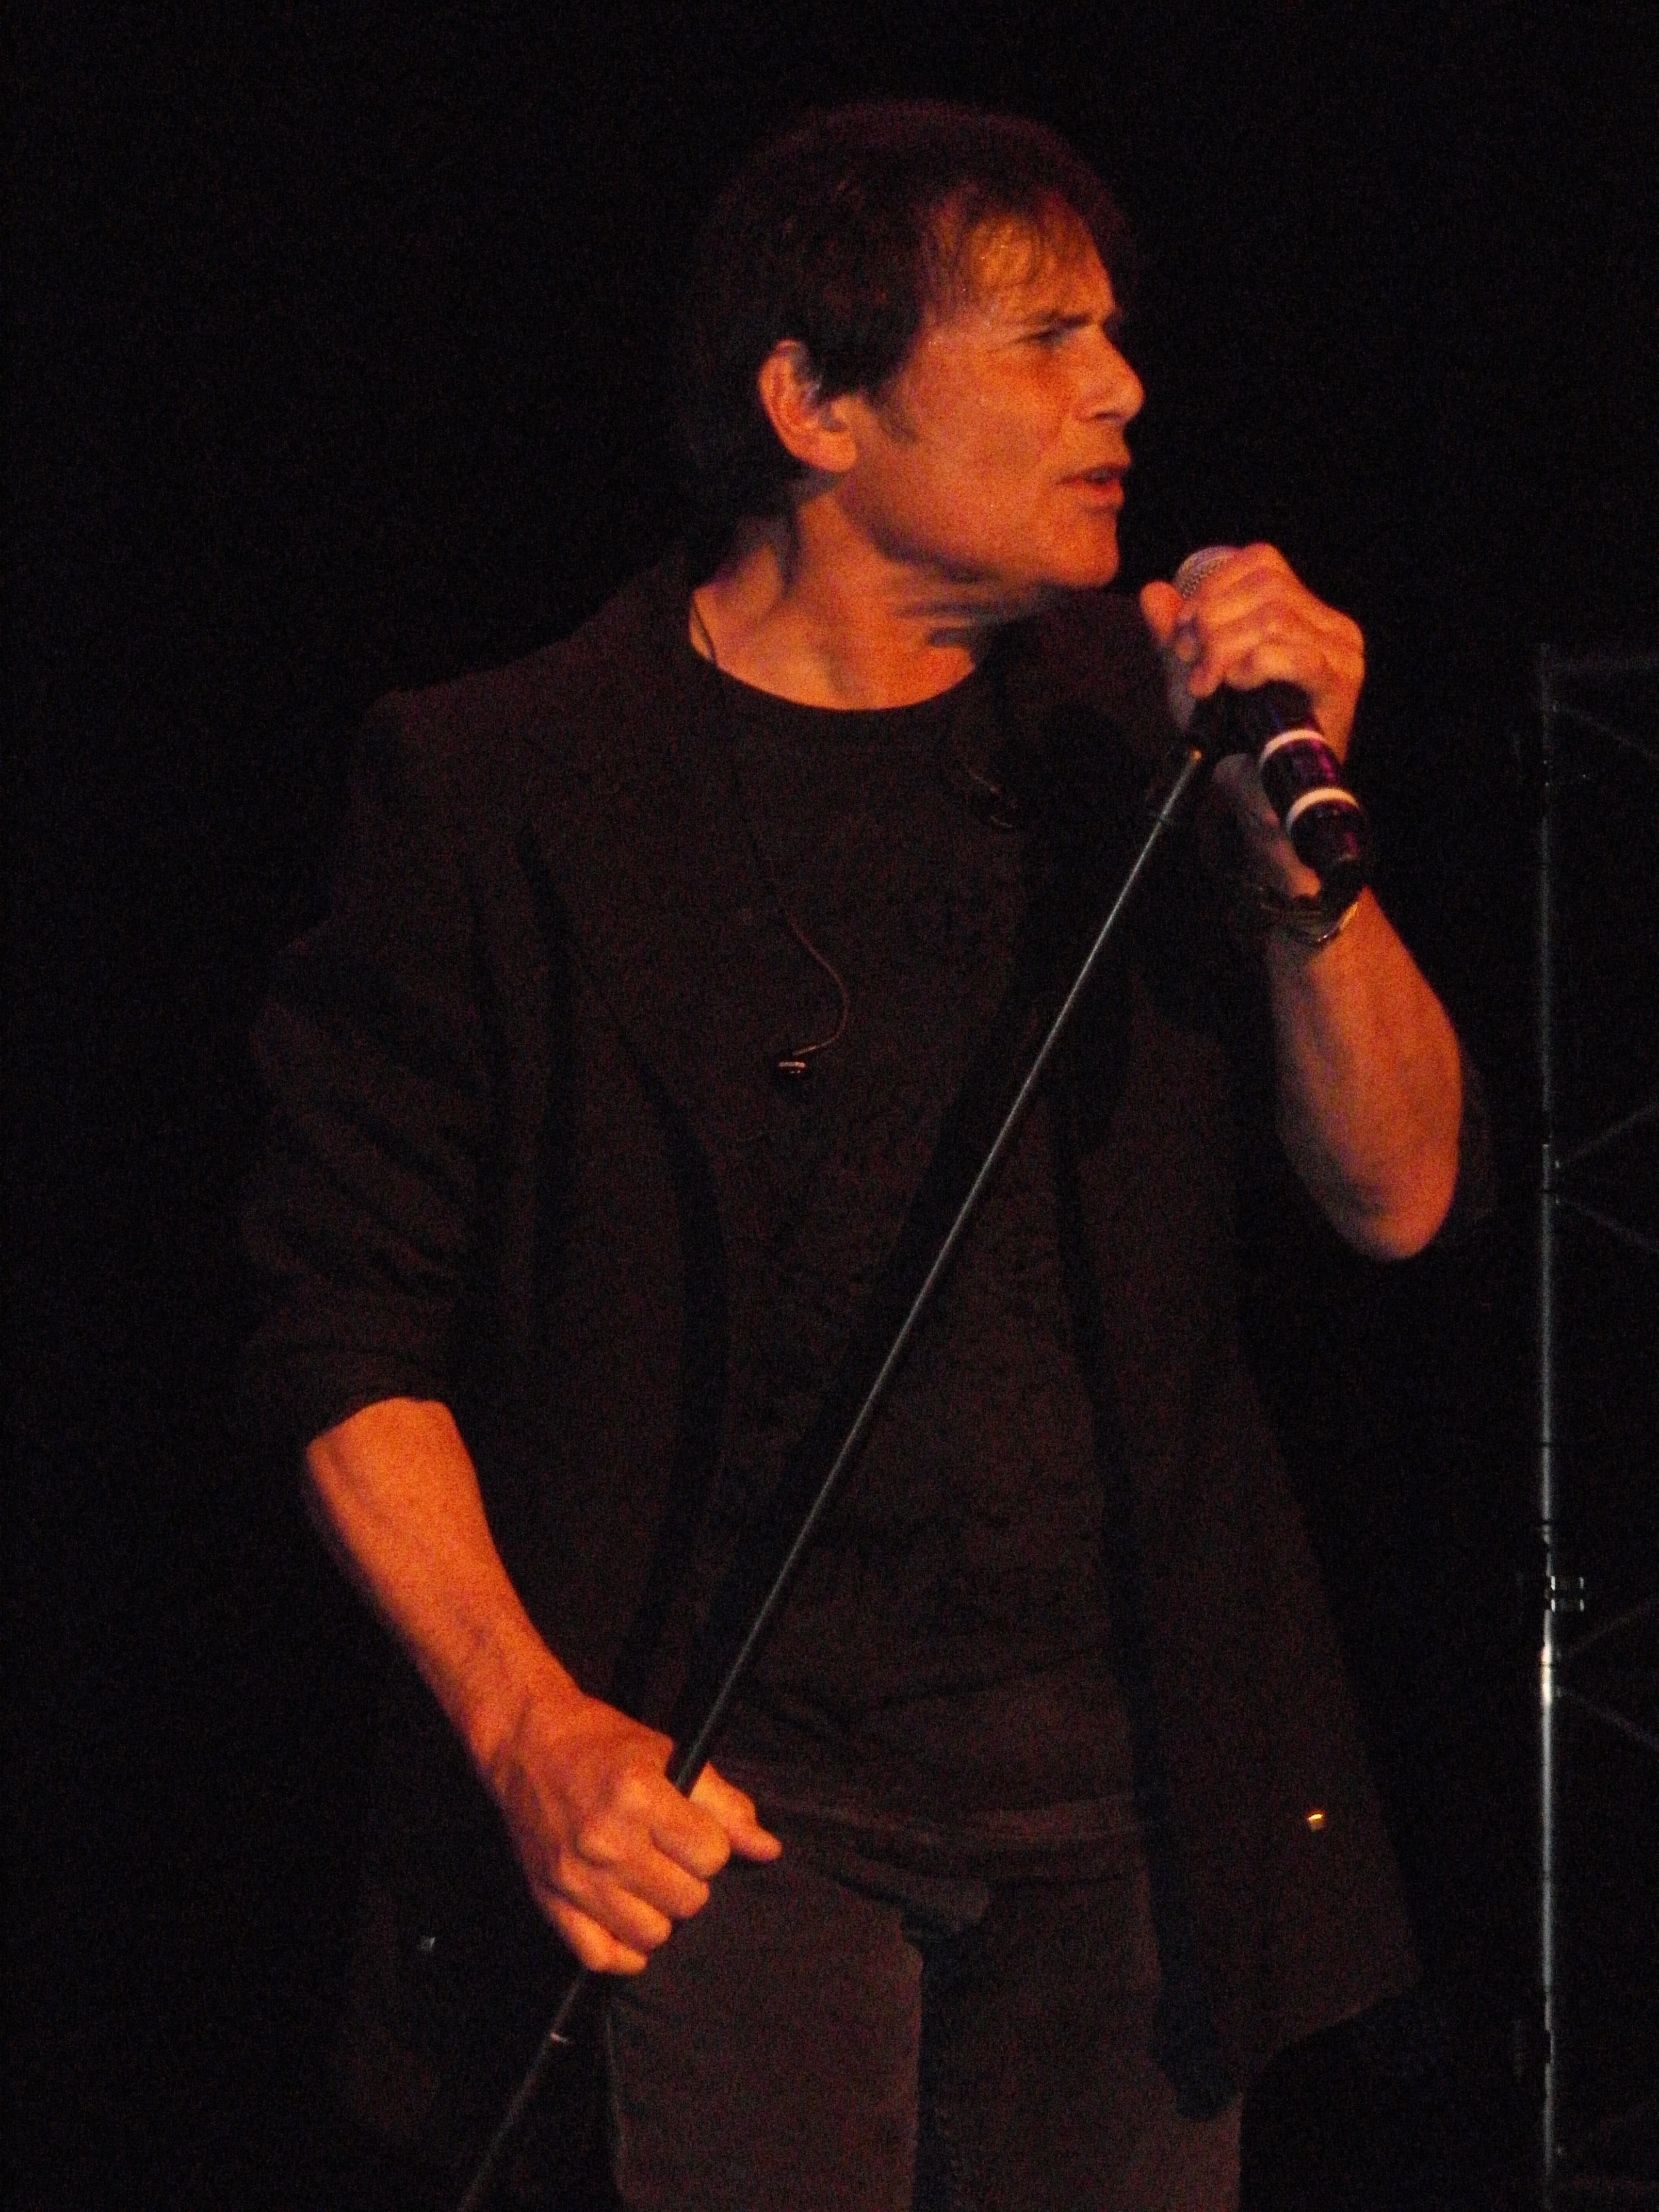 Jimi Jamison performs with Survivor photo by Jon Preiss.